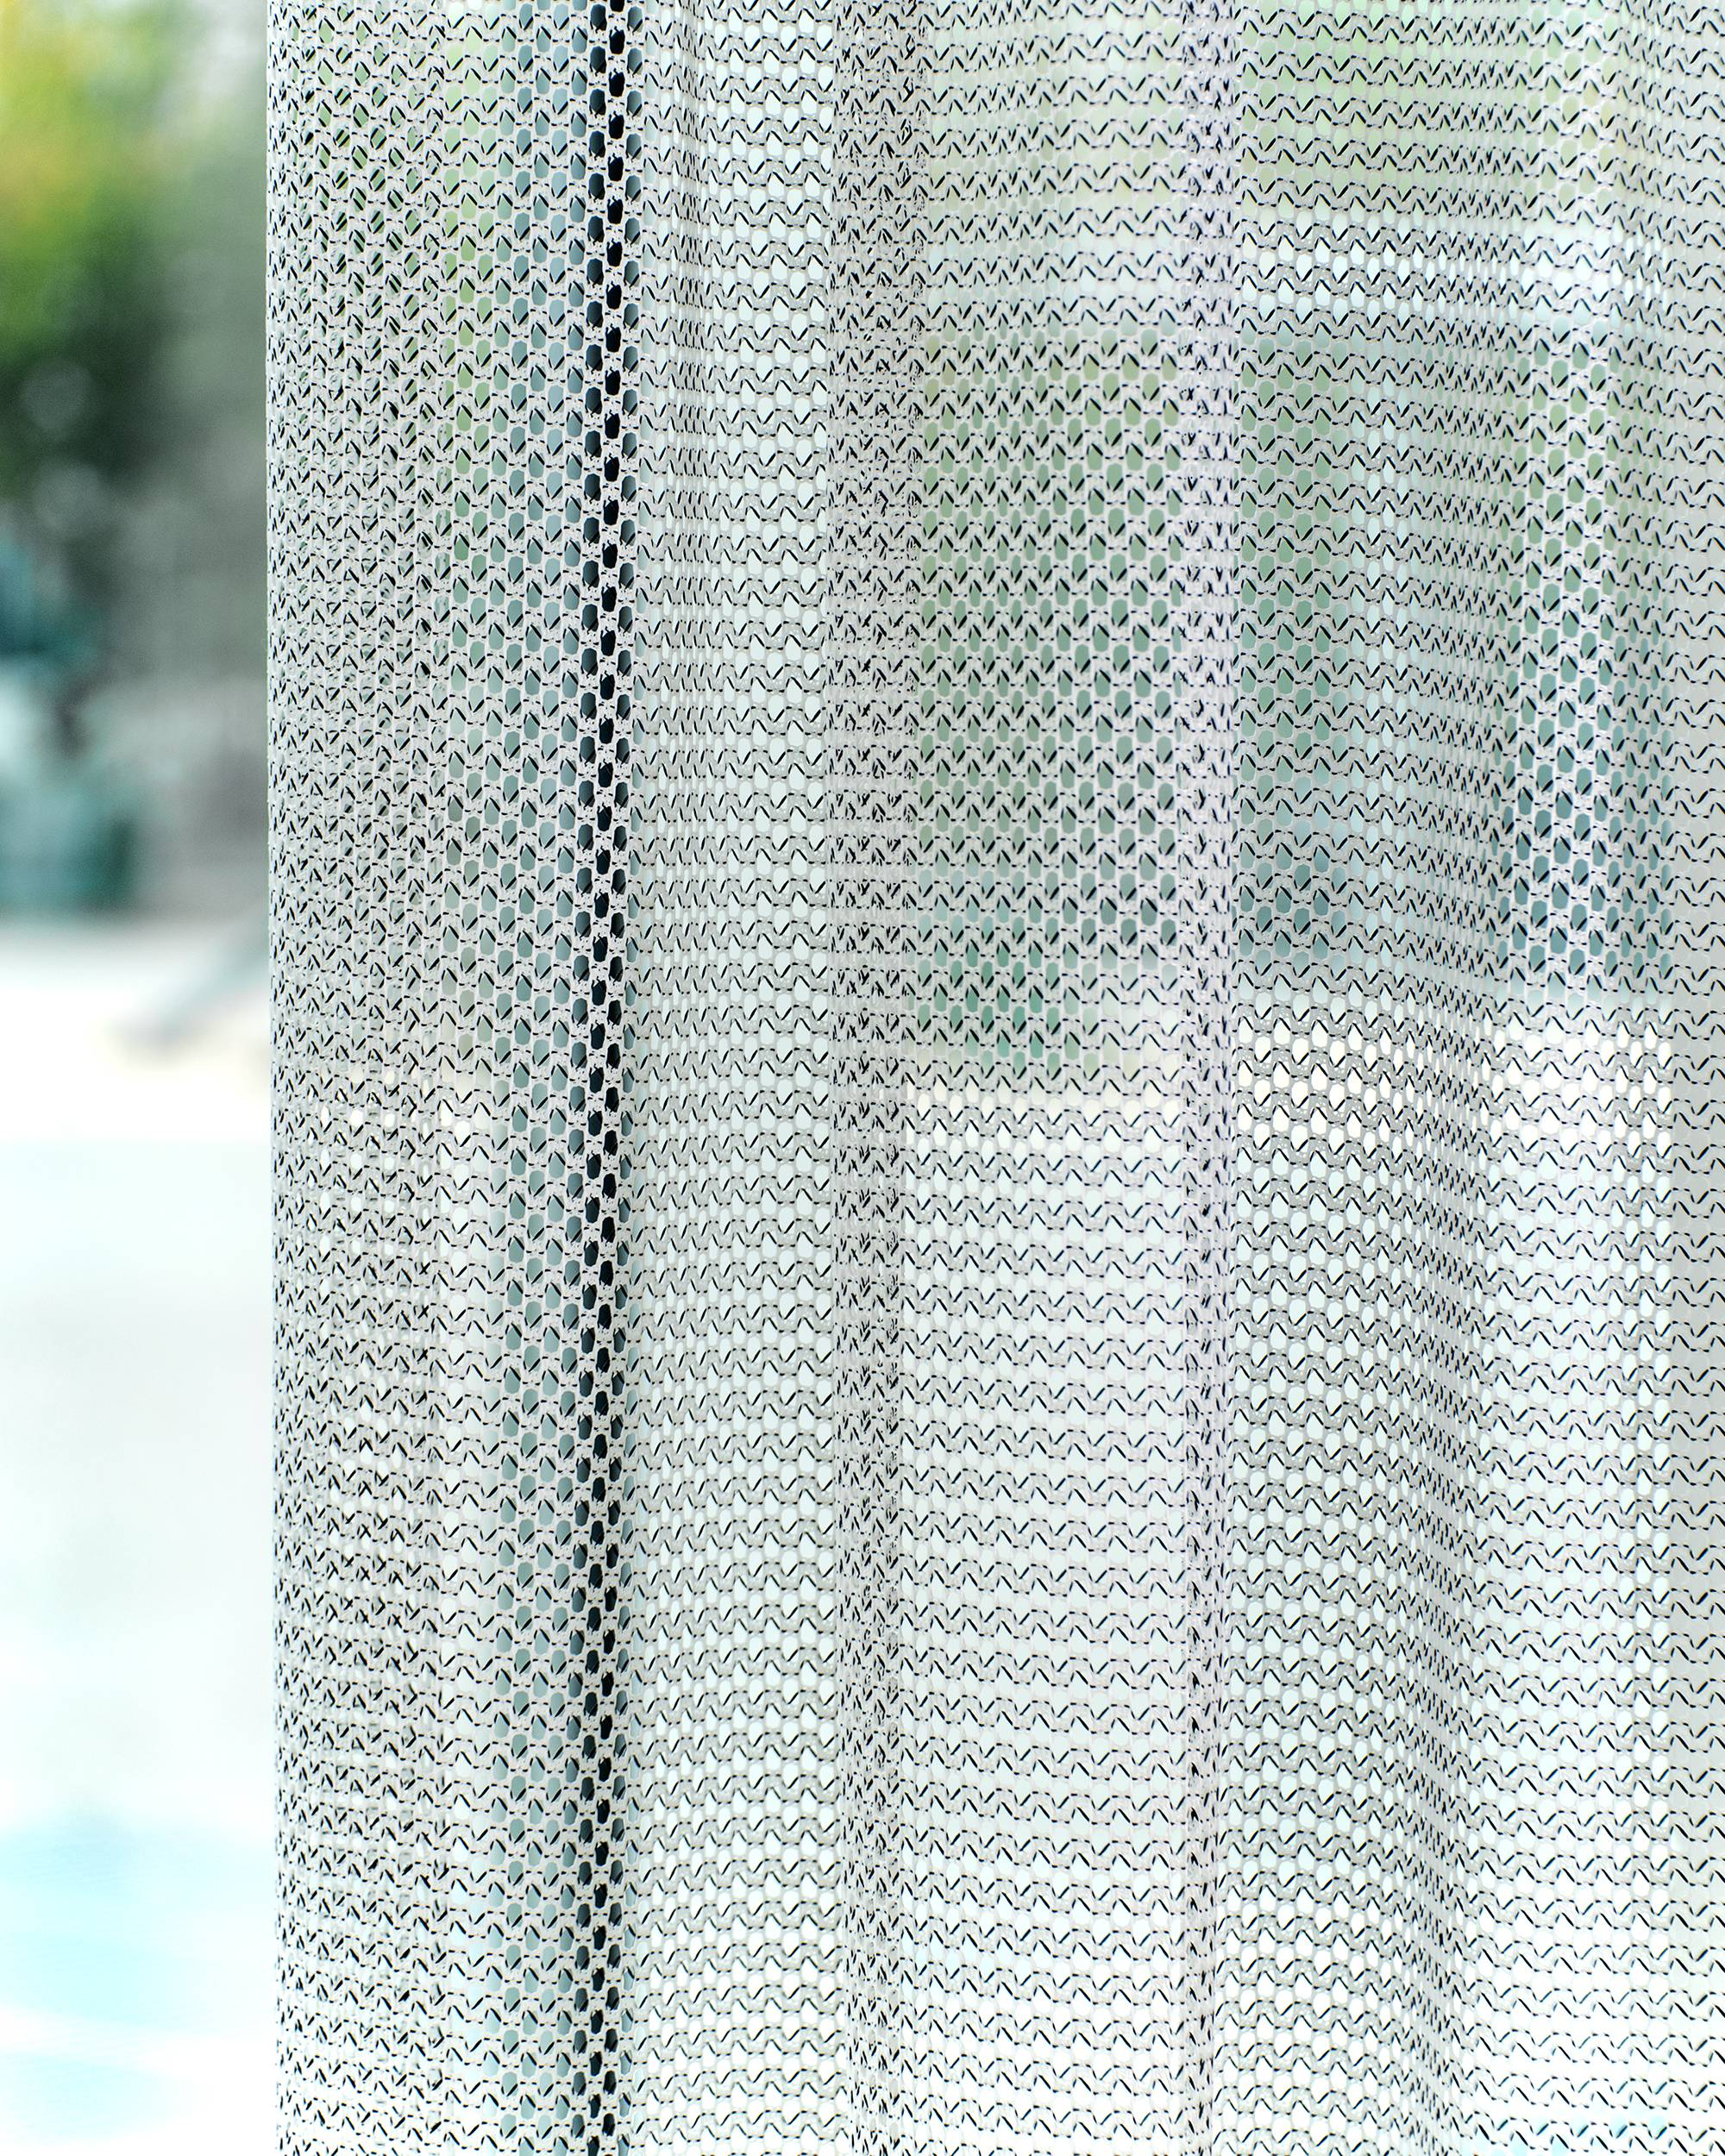 состав сетчатых штор